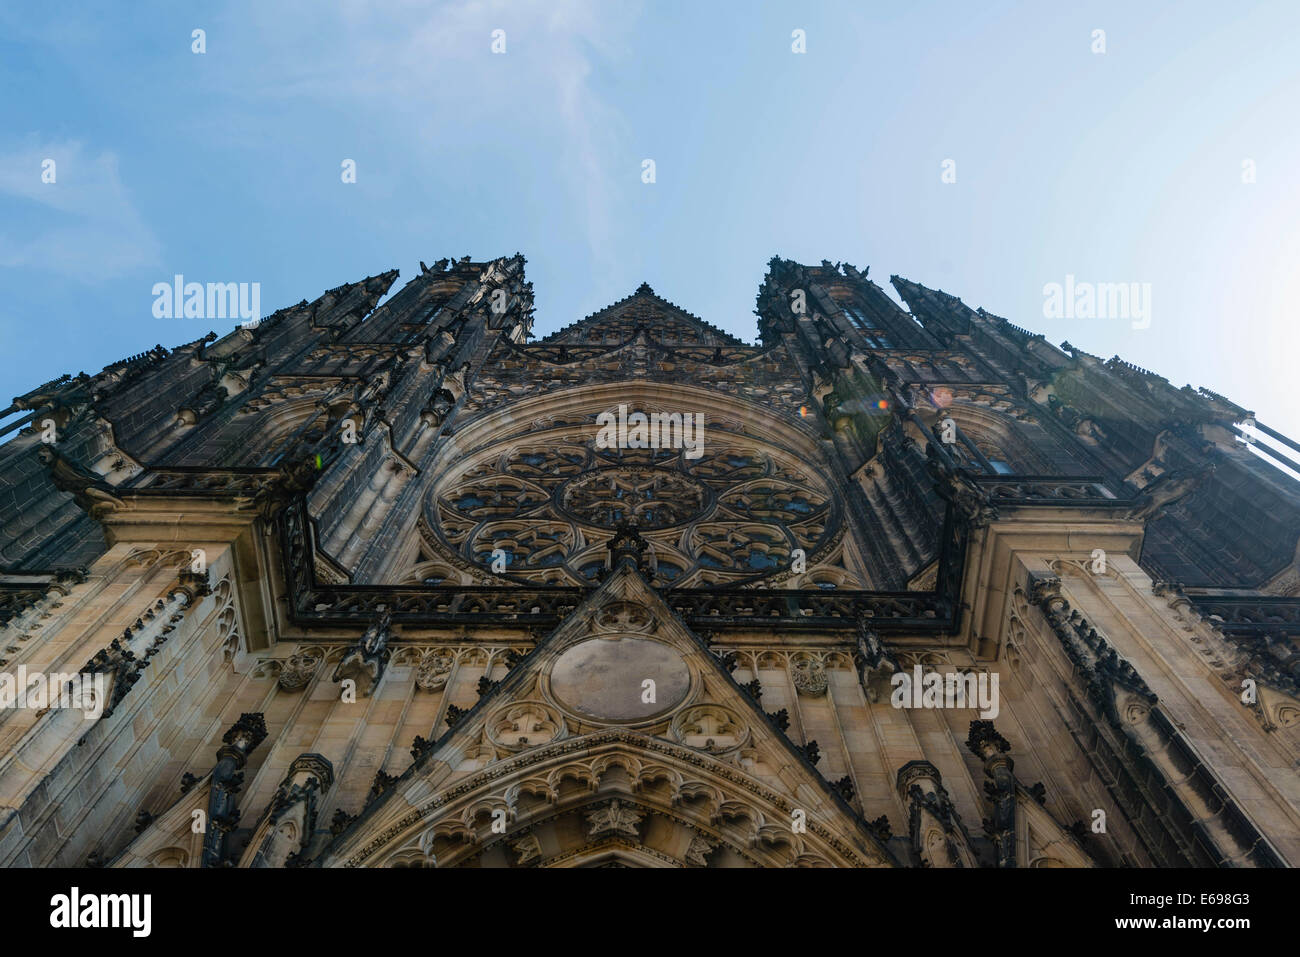 St. Vitus Cathedral, Prague Castle, Hradcany, Prague, Czech Republic Stock Photo